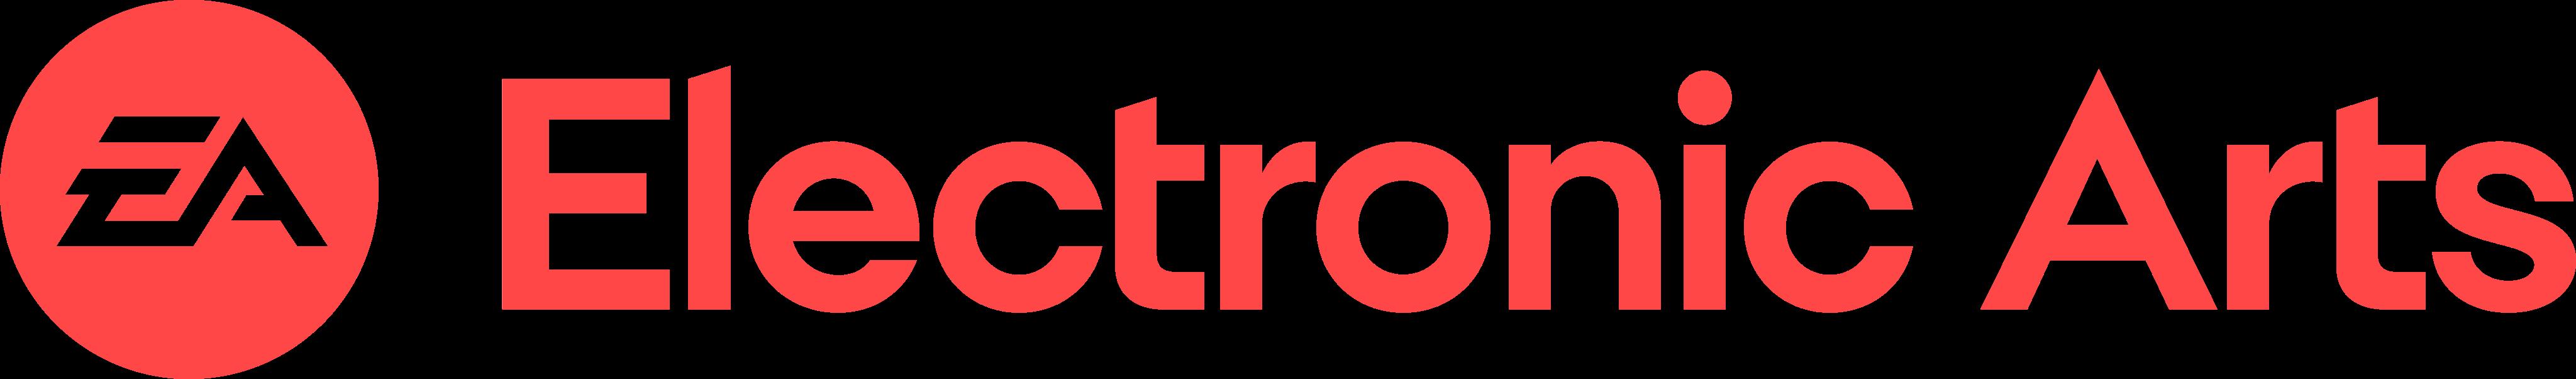 electronic arts logo - Electronic Arts Logo